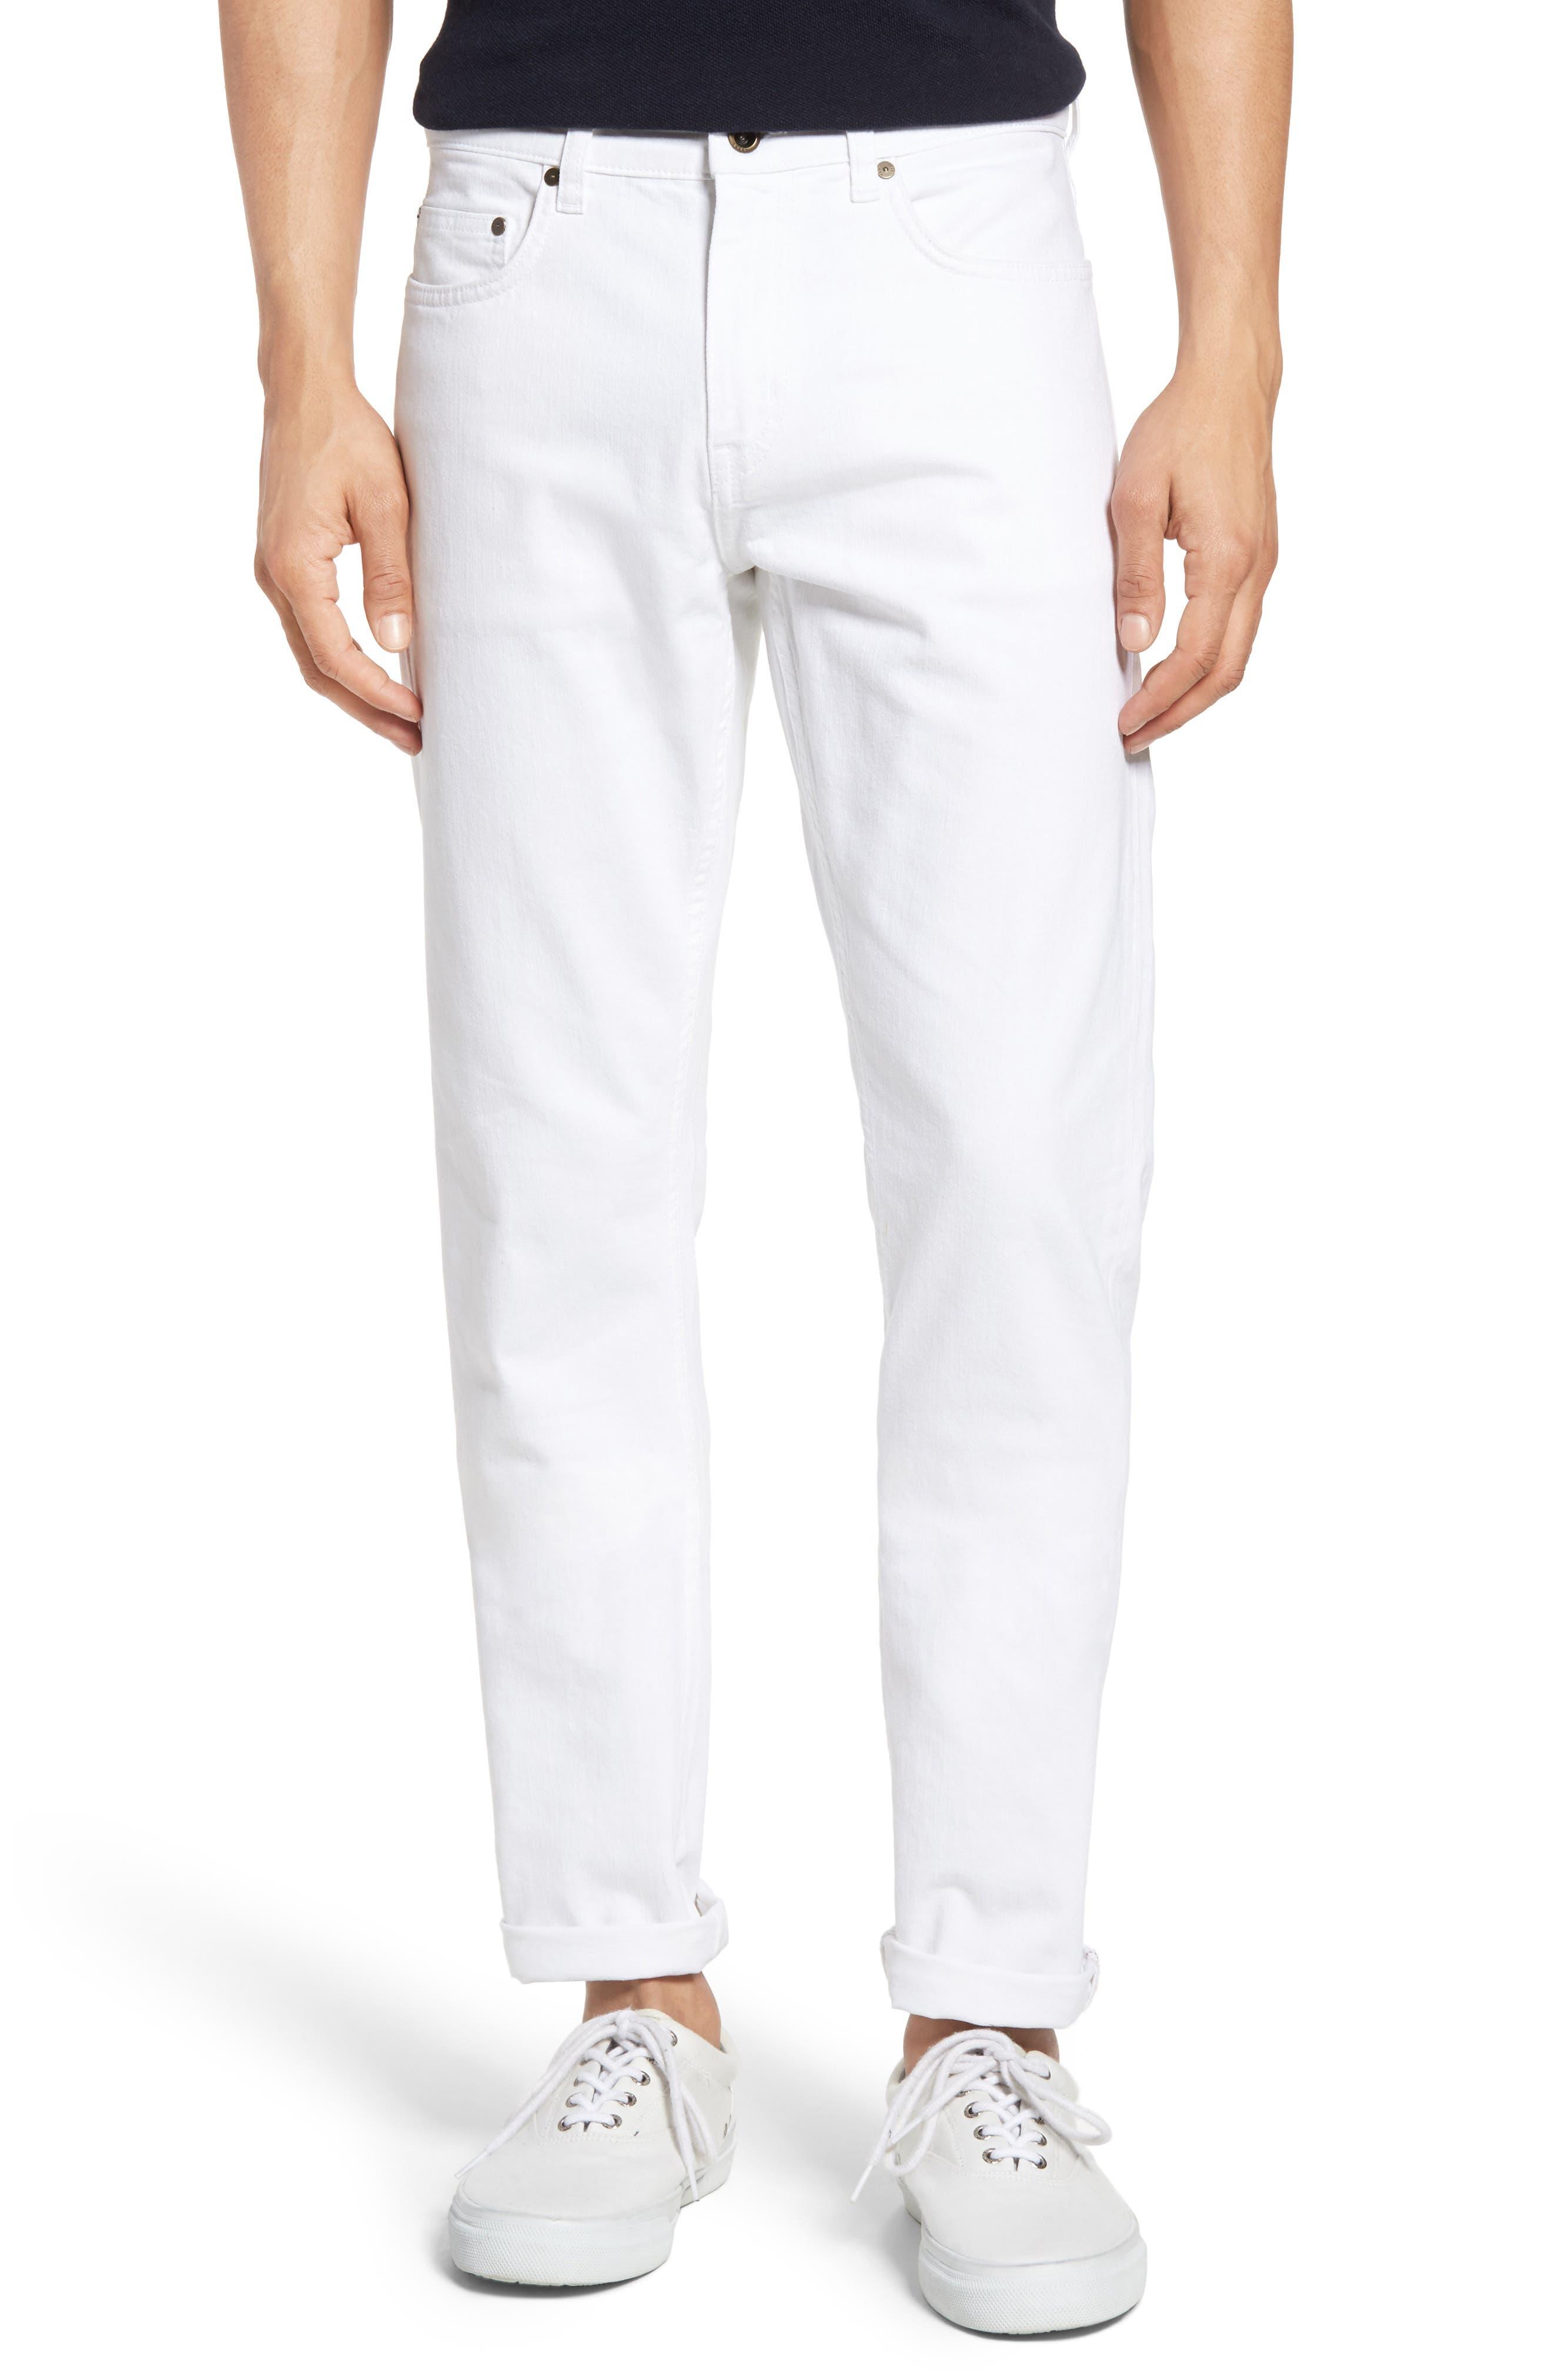 Allemand Straight Leg Jeans,                         Main,                         color, Snow